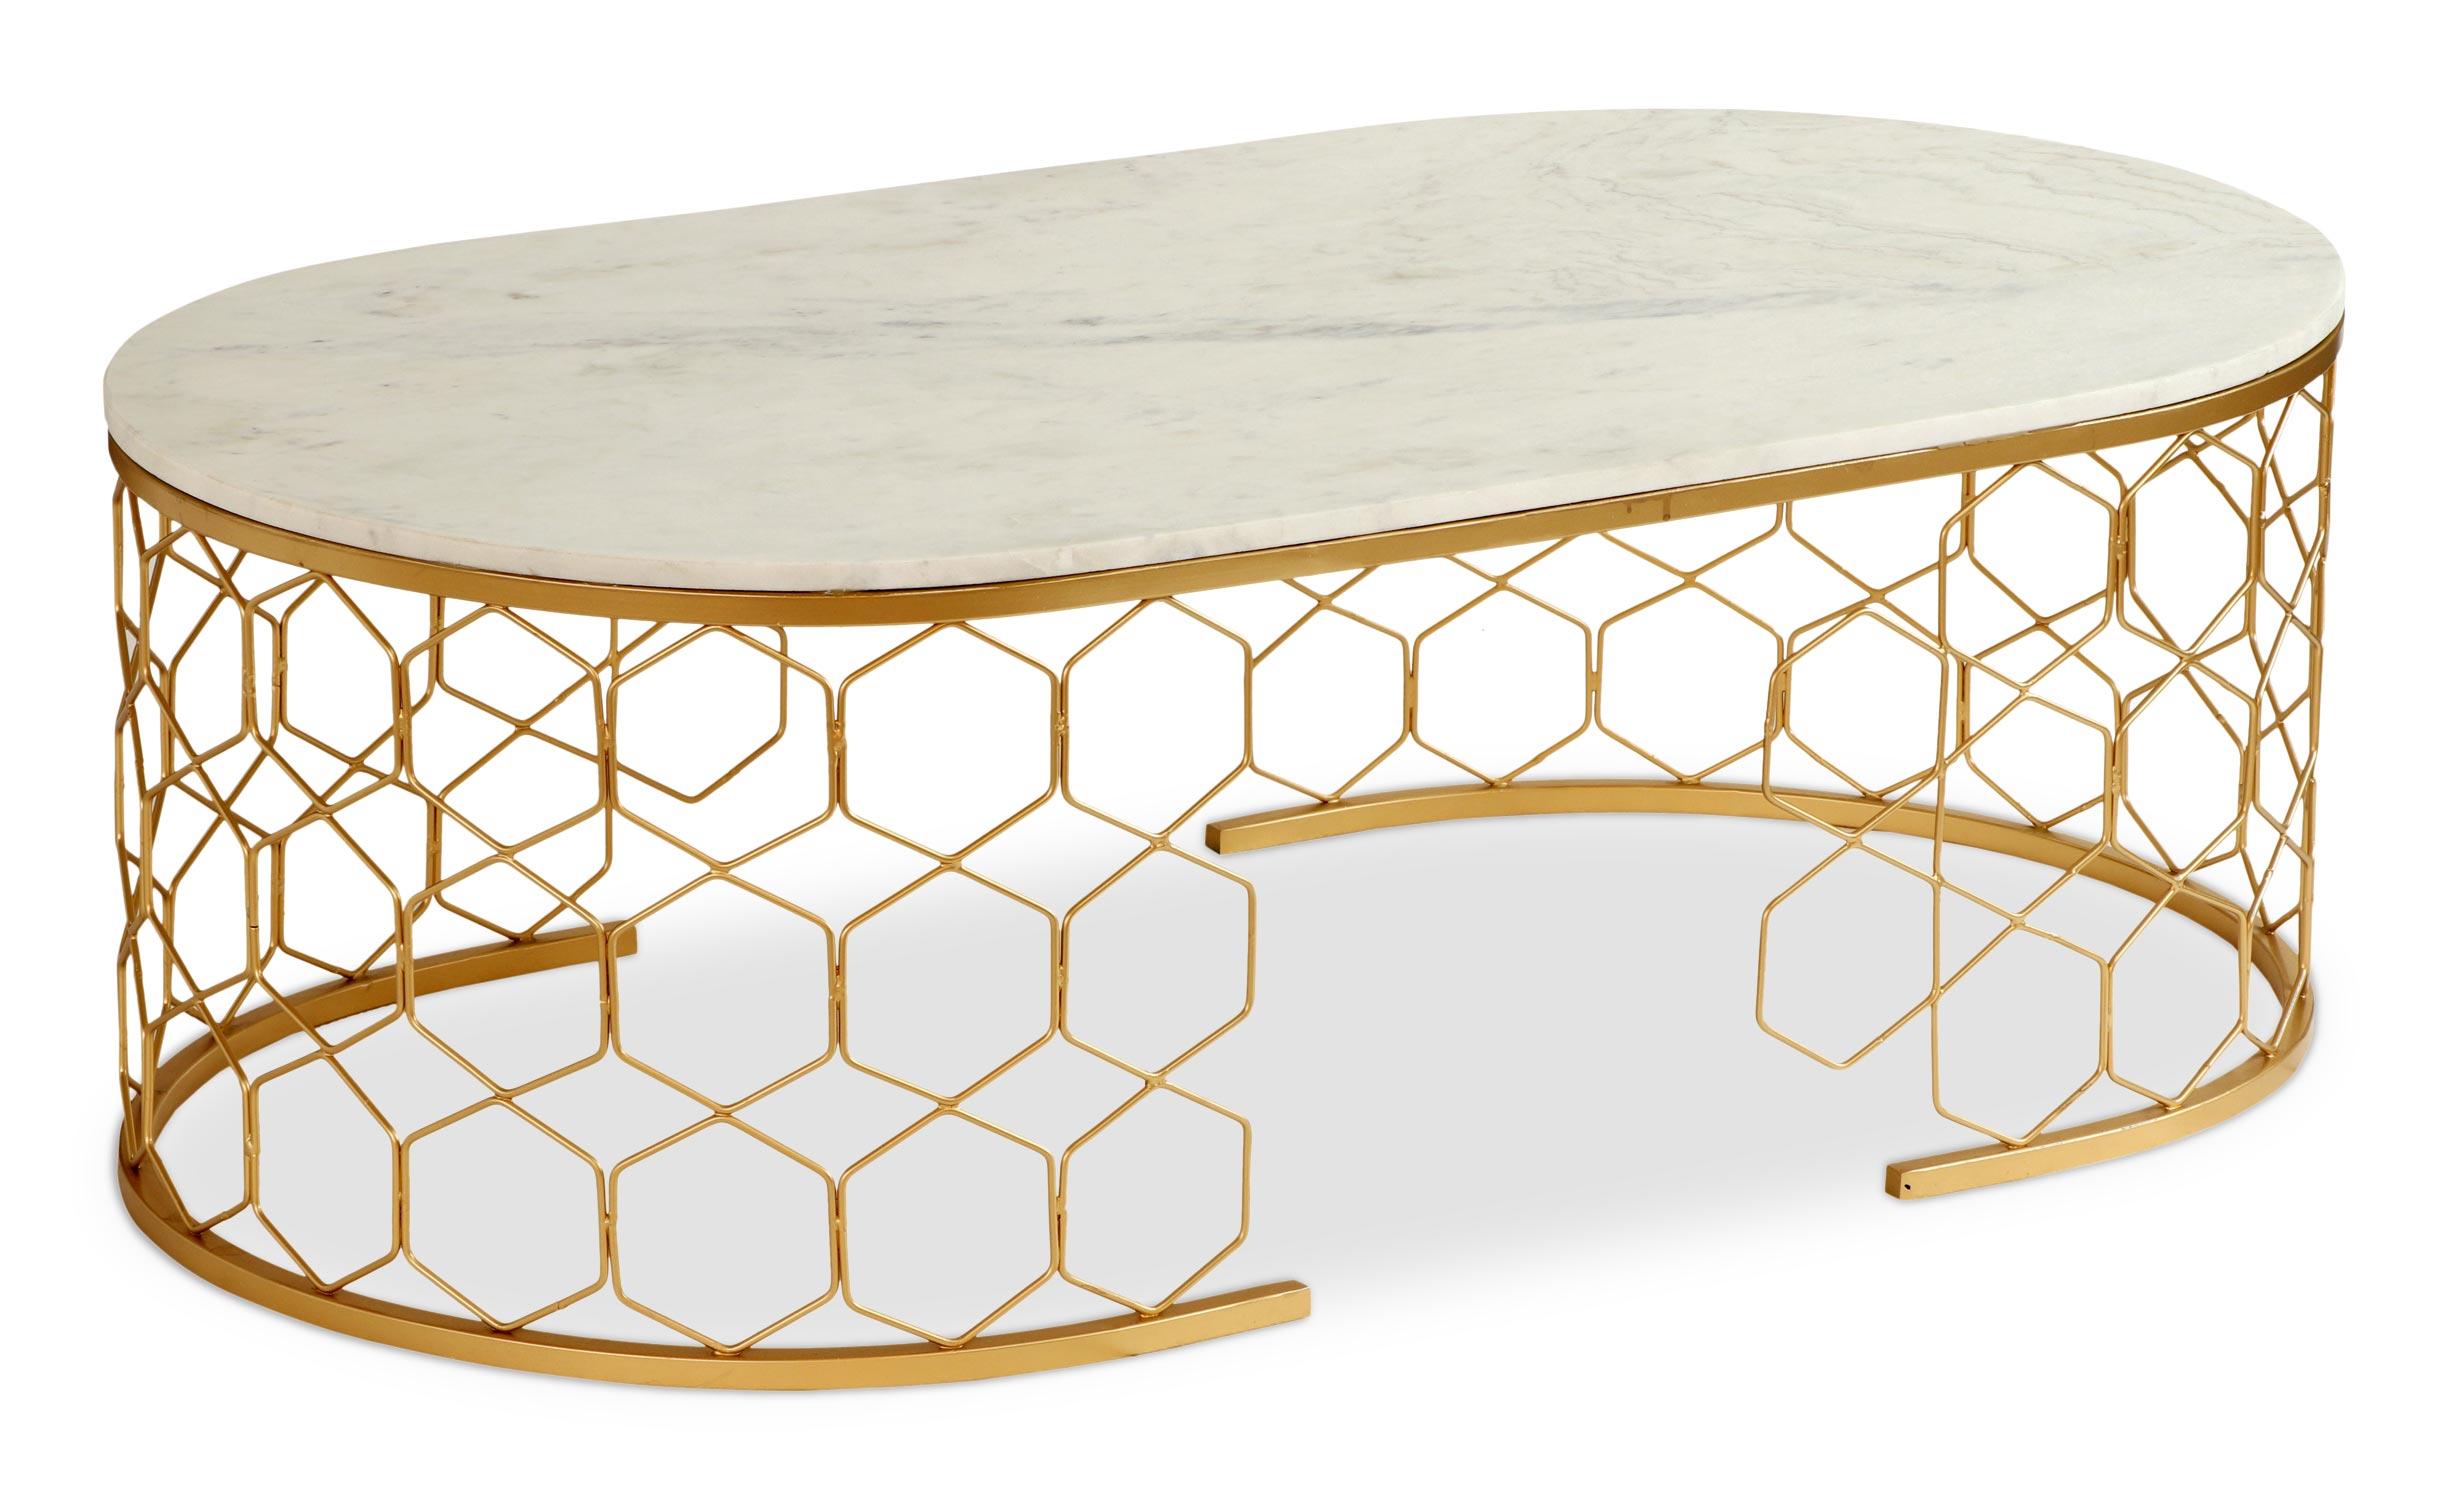 Table basse design Mayano Marbre et Métal Or